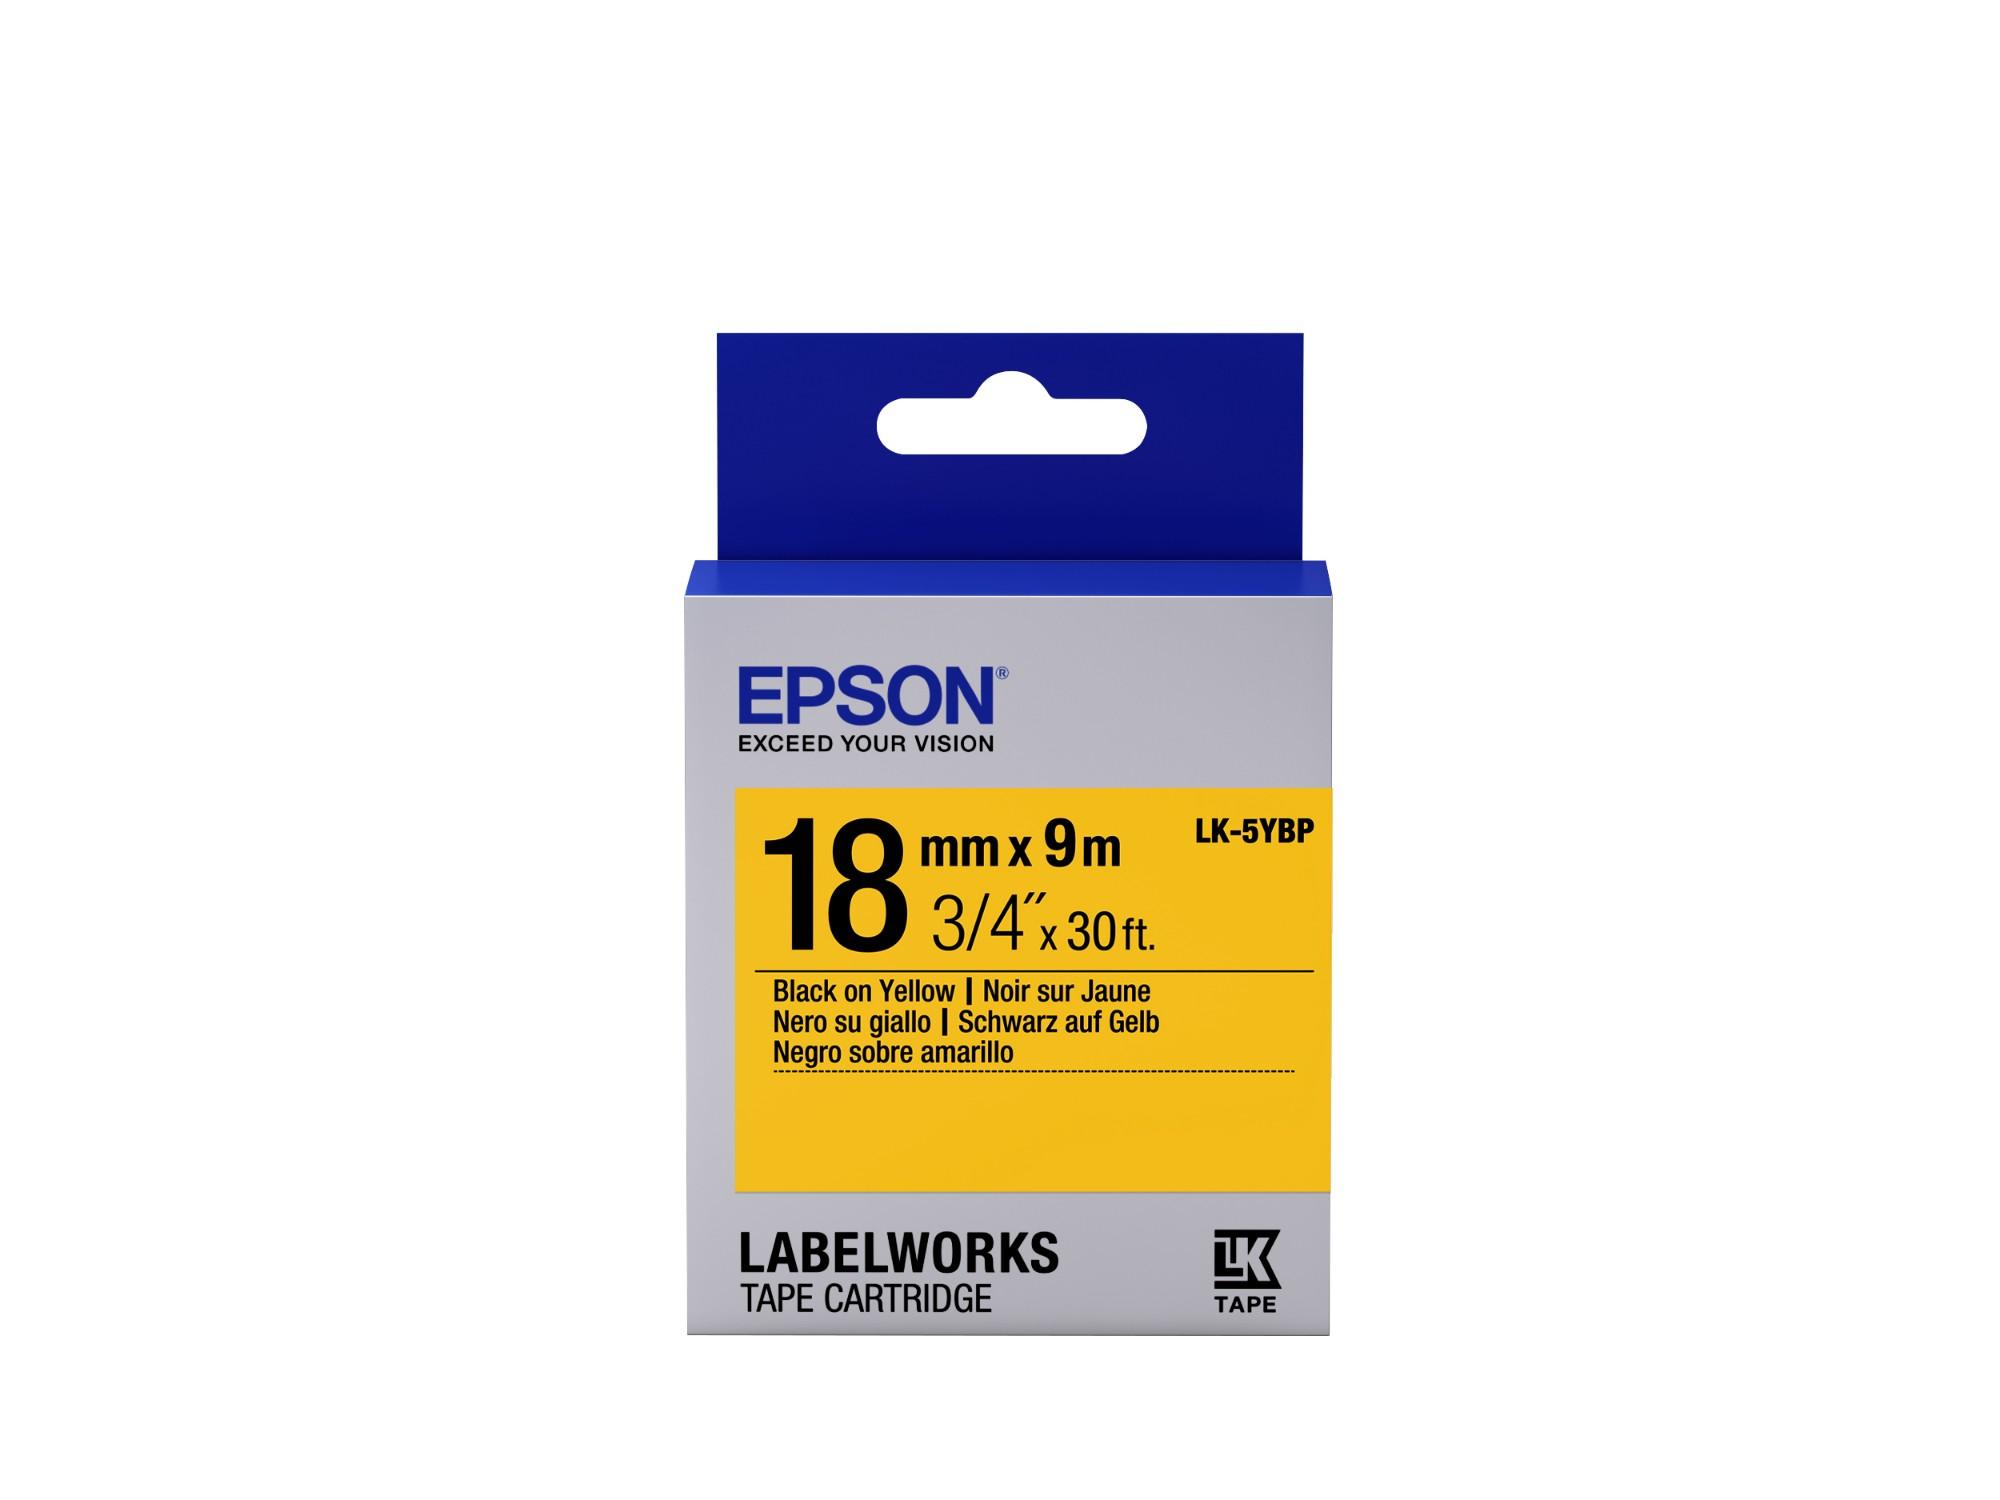 Epson Pastel Tape - LK-5YBP Pastel Blk/Yell 18/9